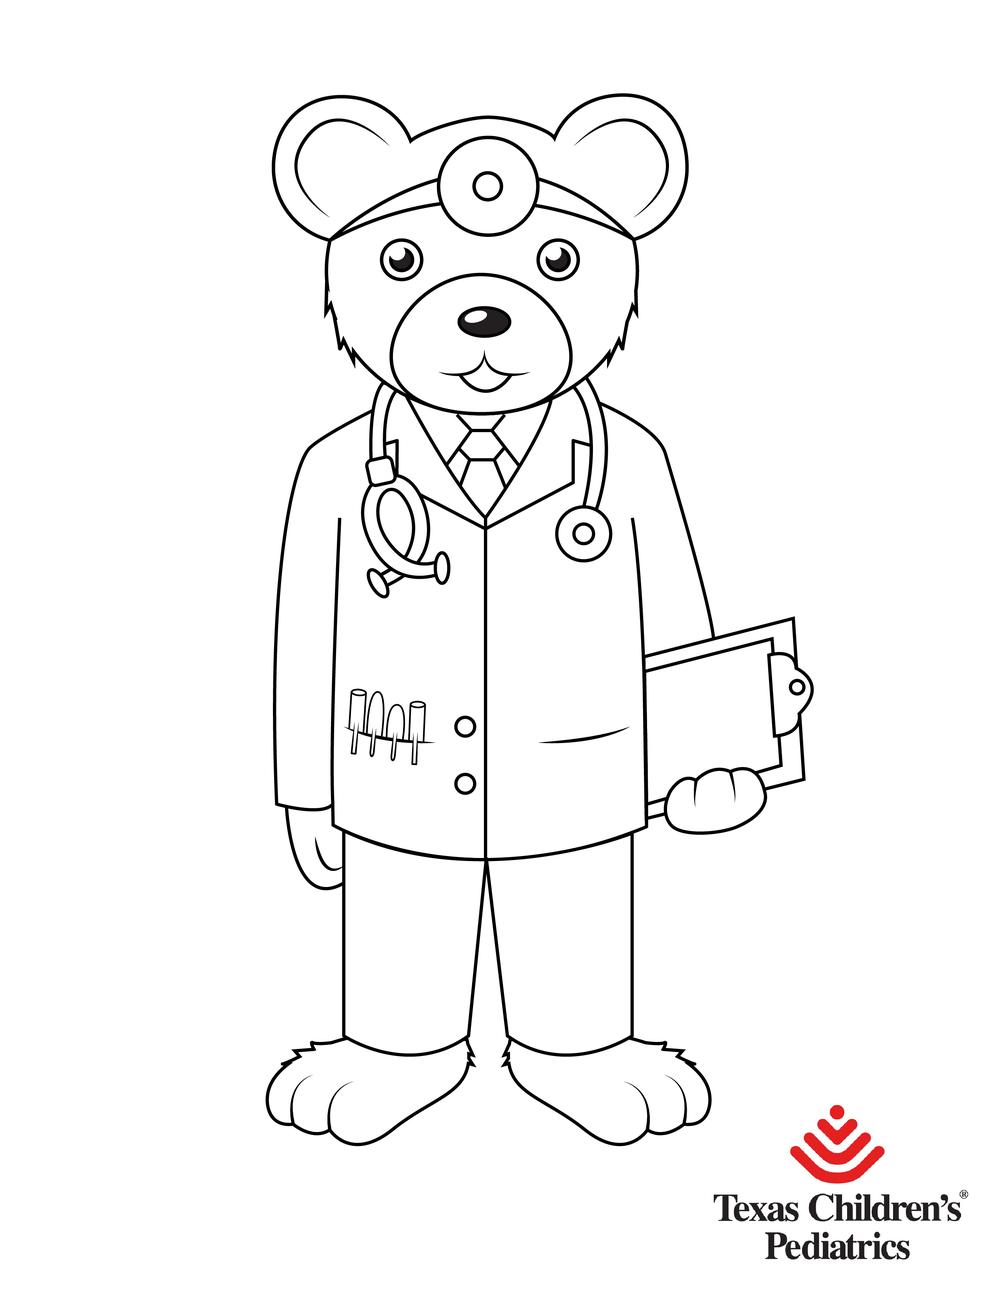 TeddyBearDr_coloringpage-01.png